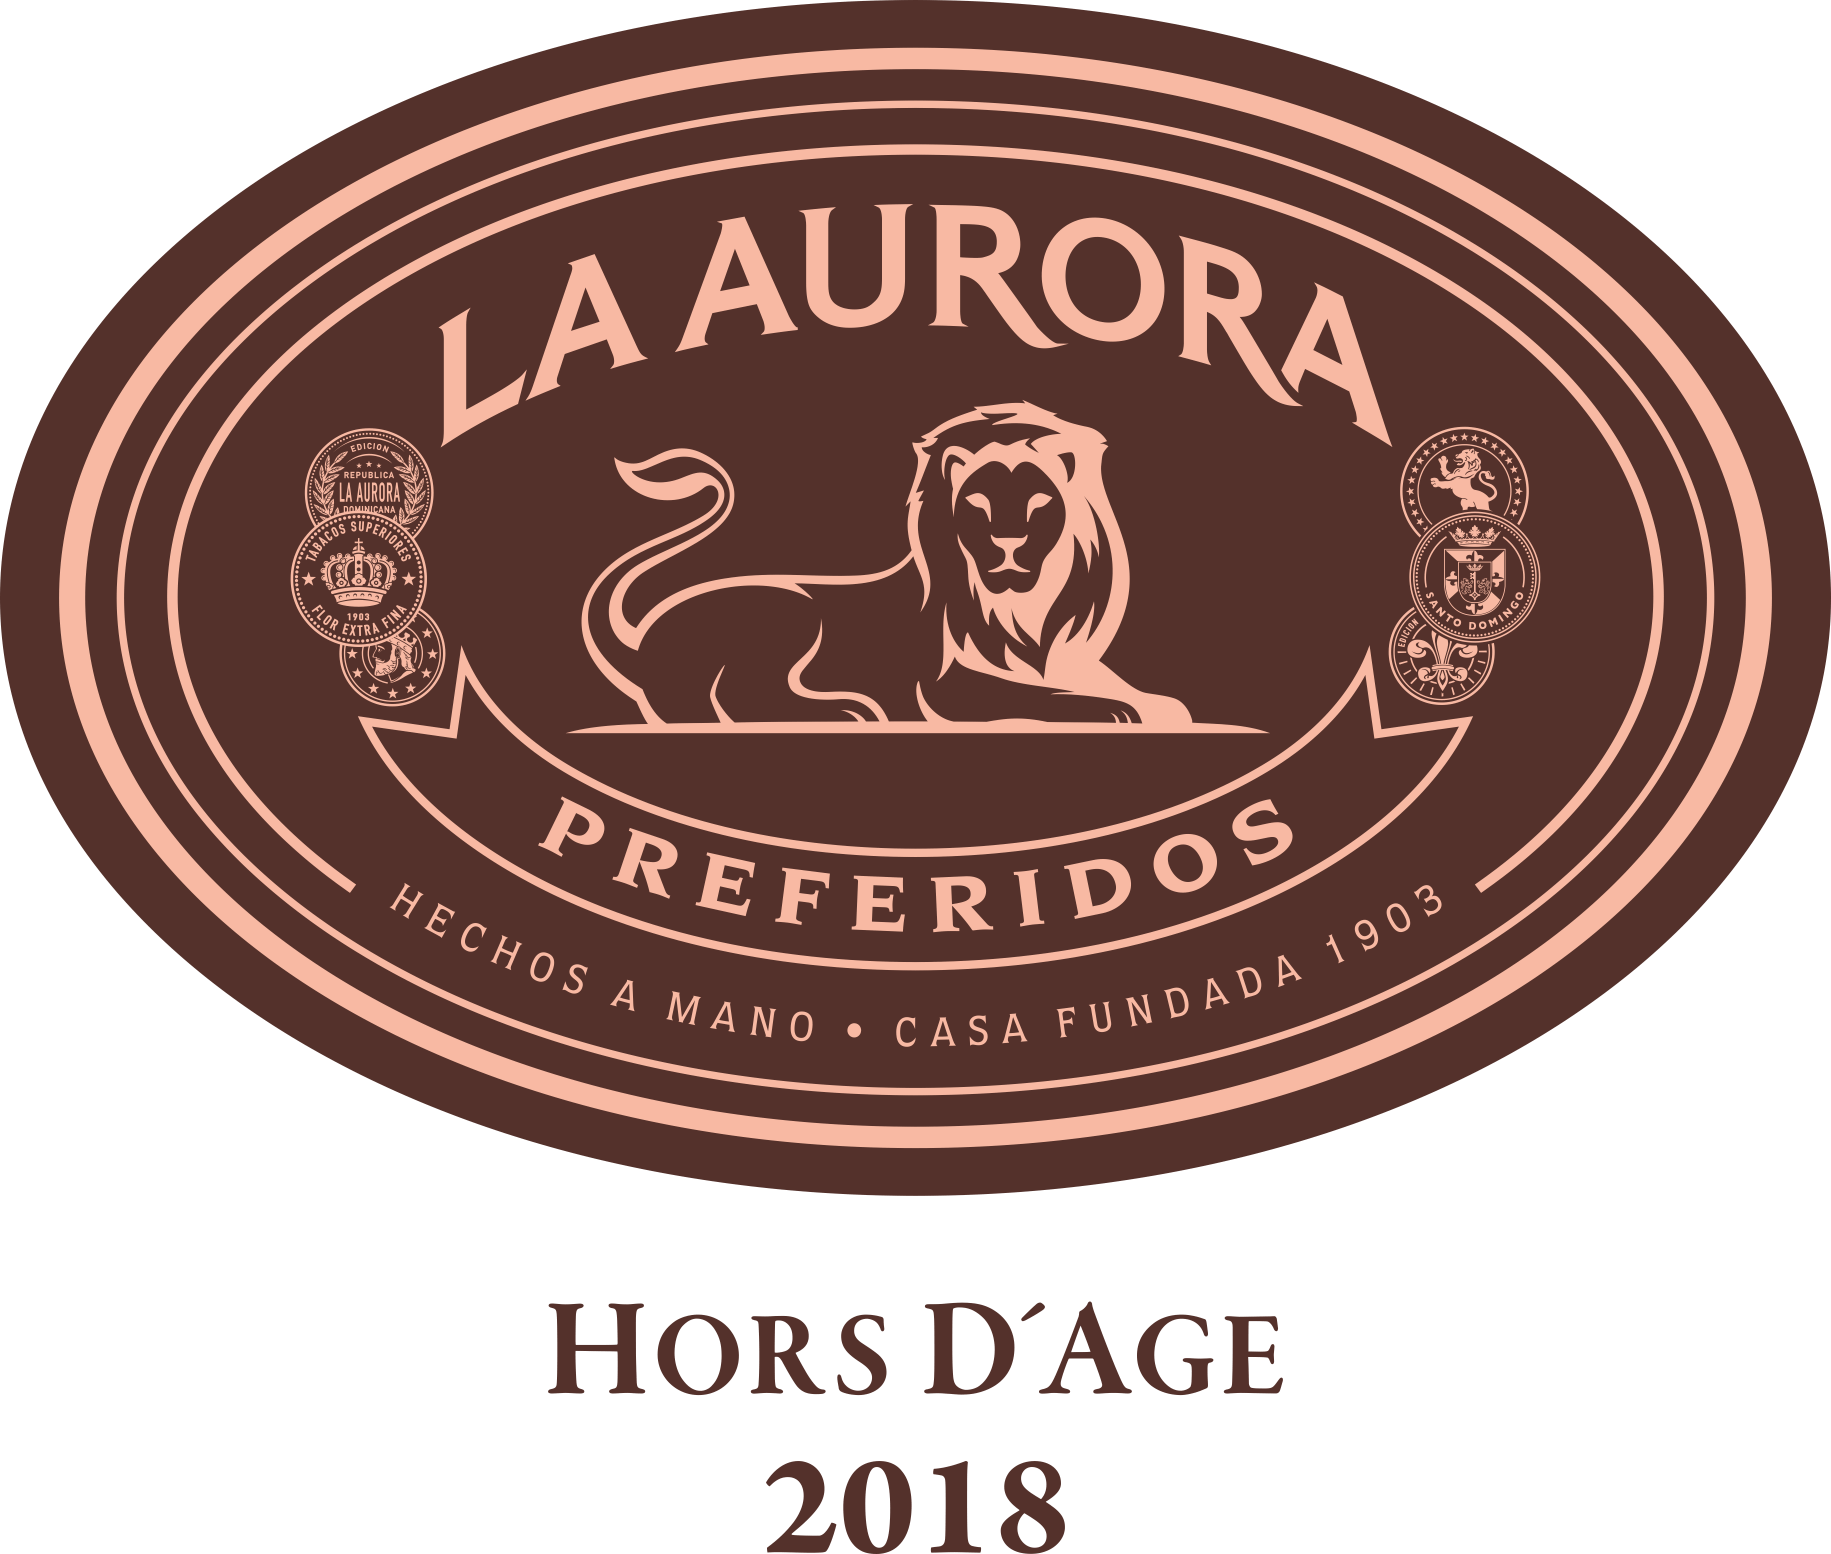 Cigar News: La Aurora Announce Preferidos Hors d'Age 2018